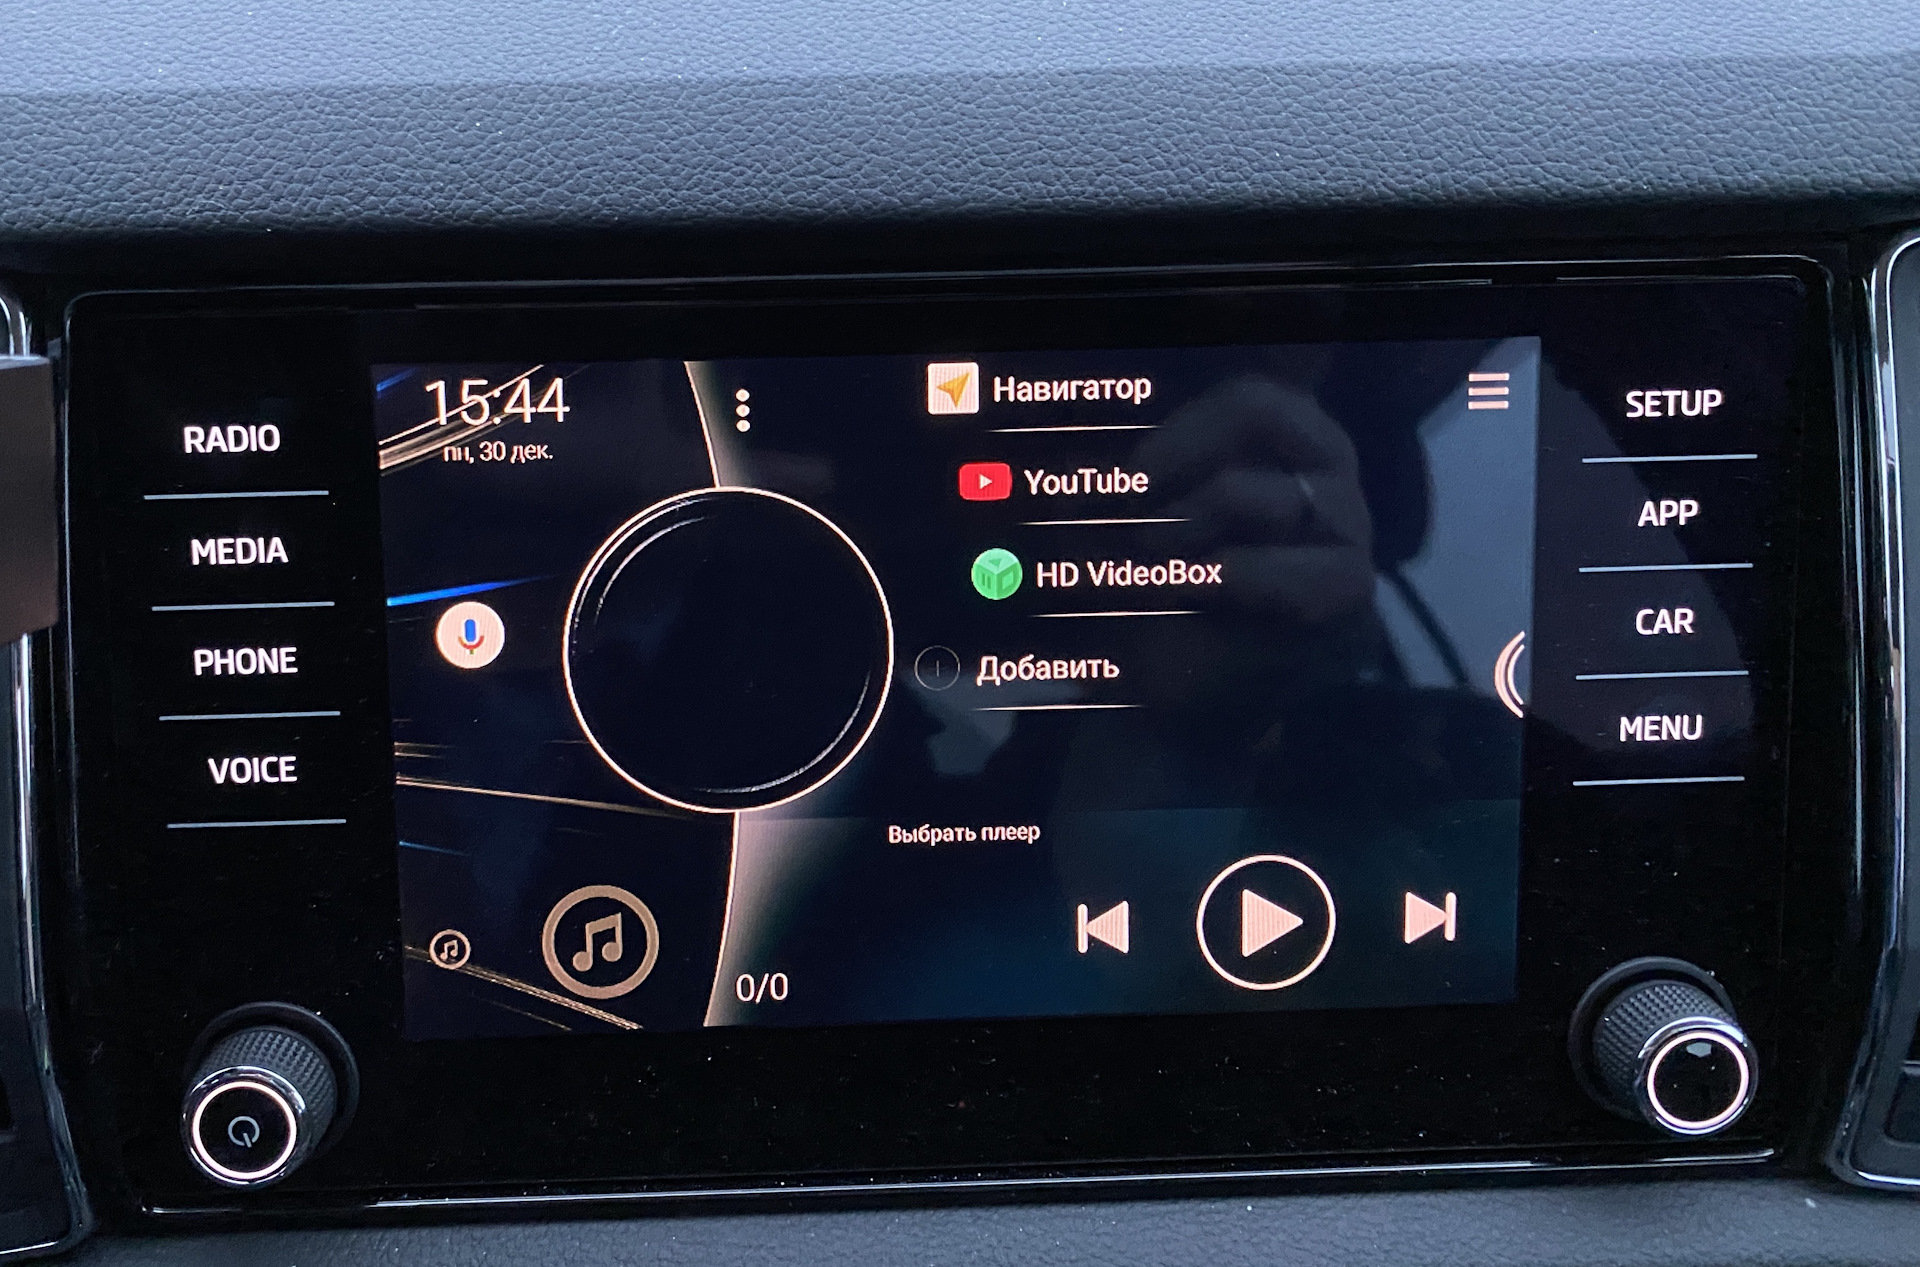 Установка навигации на Android в Москве